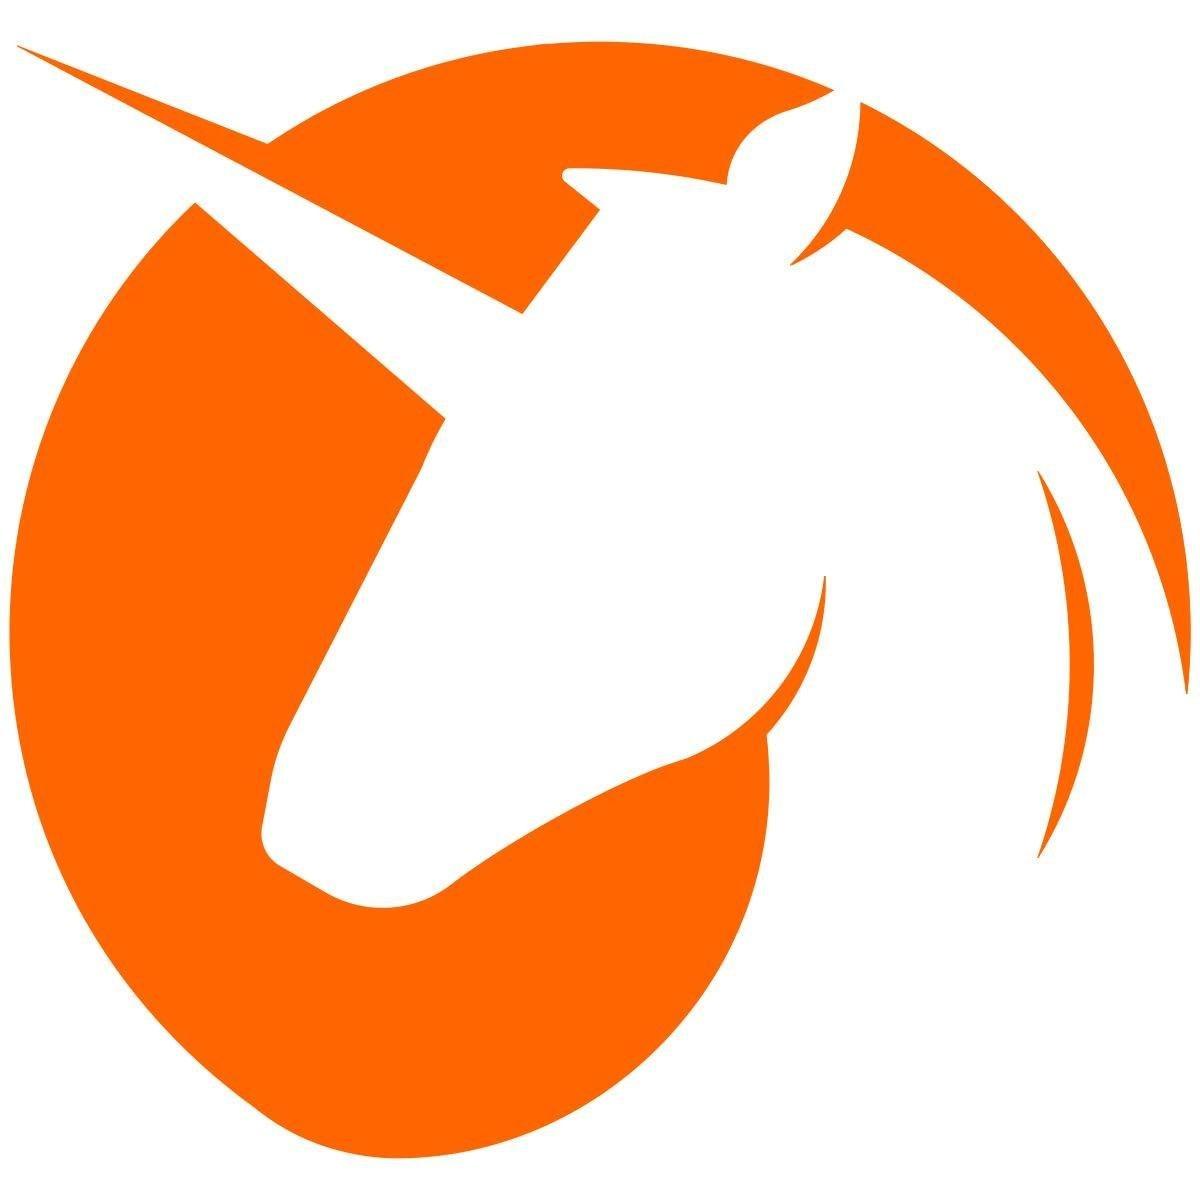 Unicorn Graphic